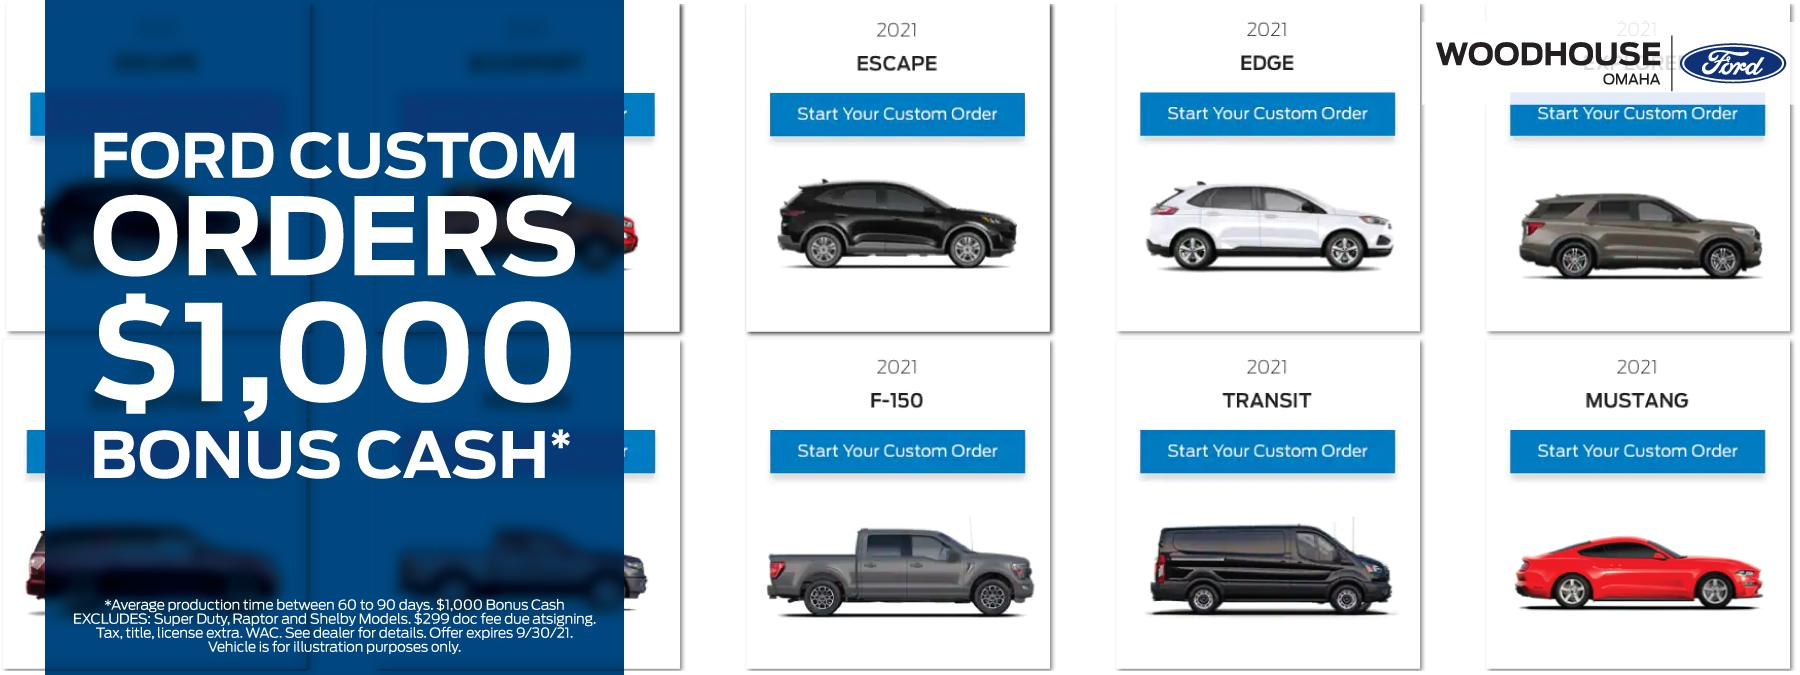 0921-Ford-OMAHA-1000-BONUS-CASH-DESKTOP